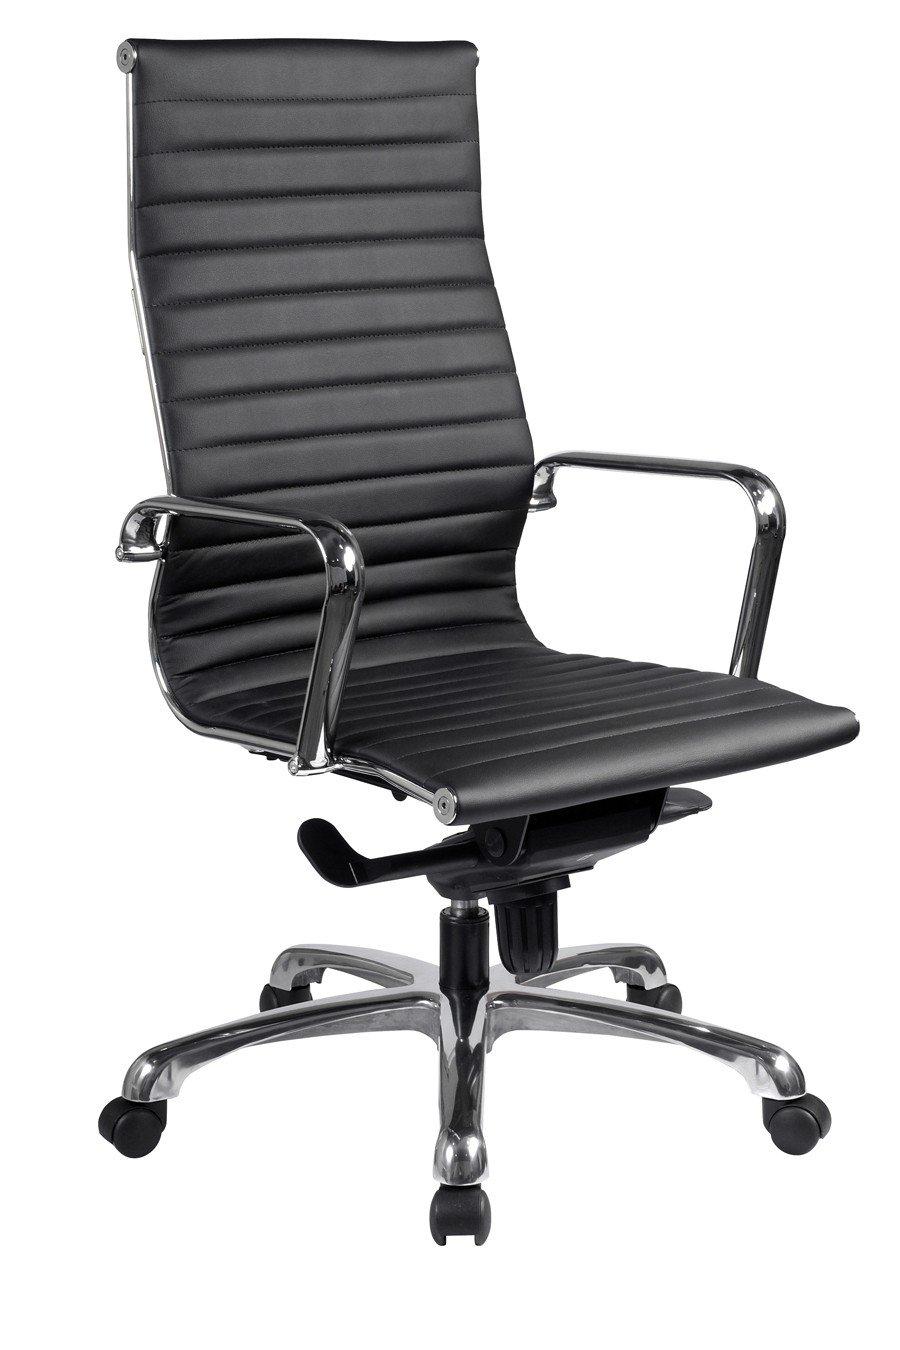 Nova HighBack Executive Office Chair